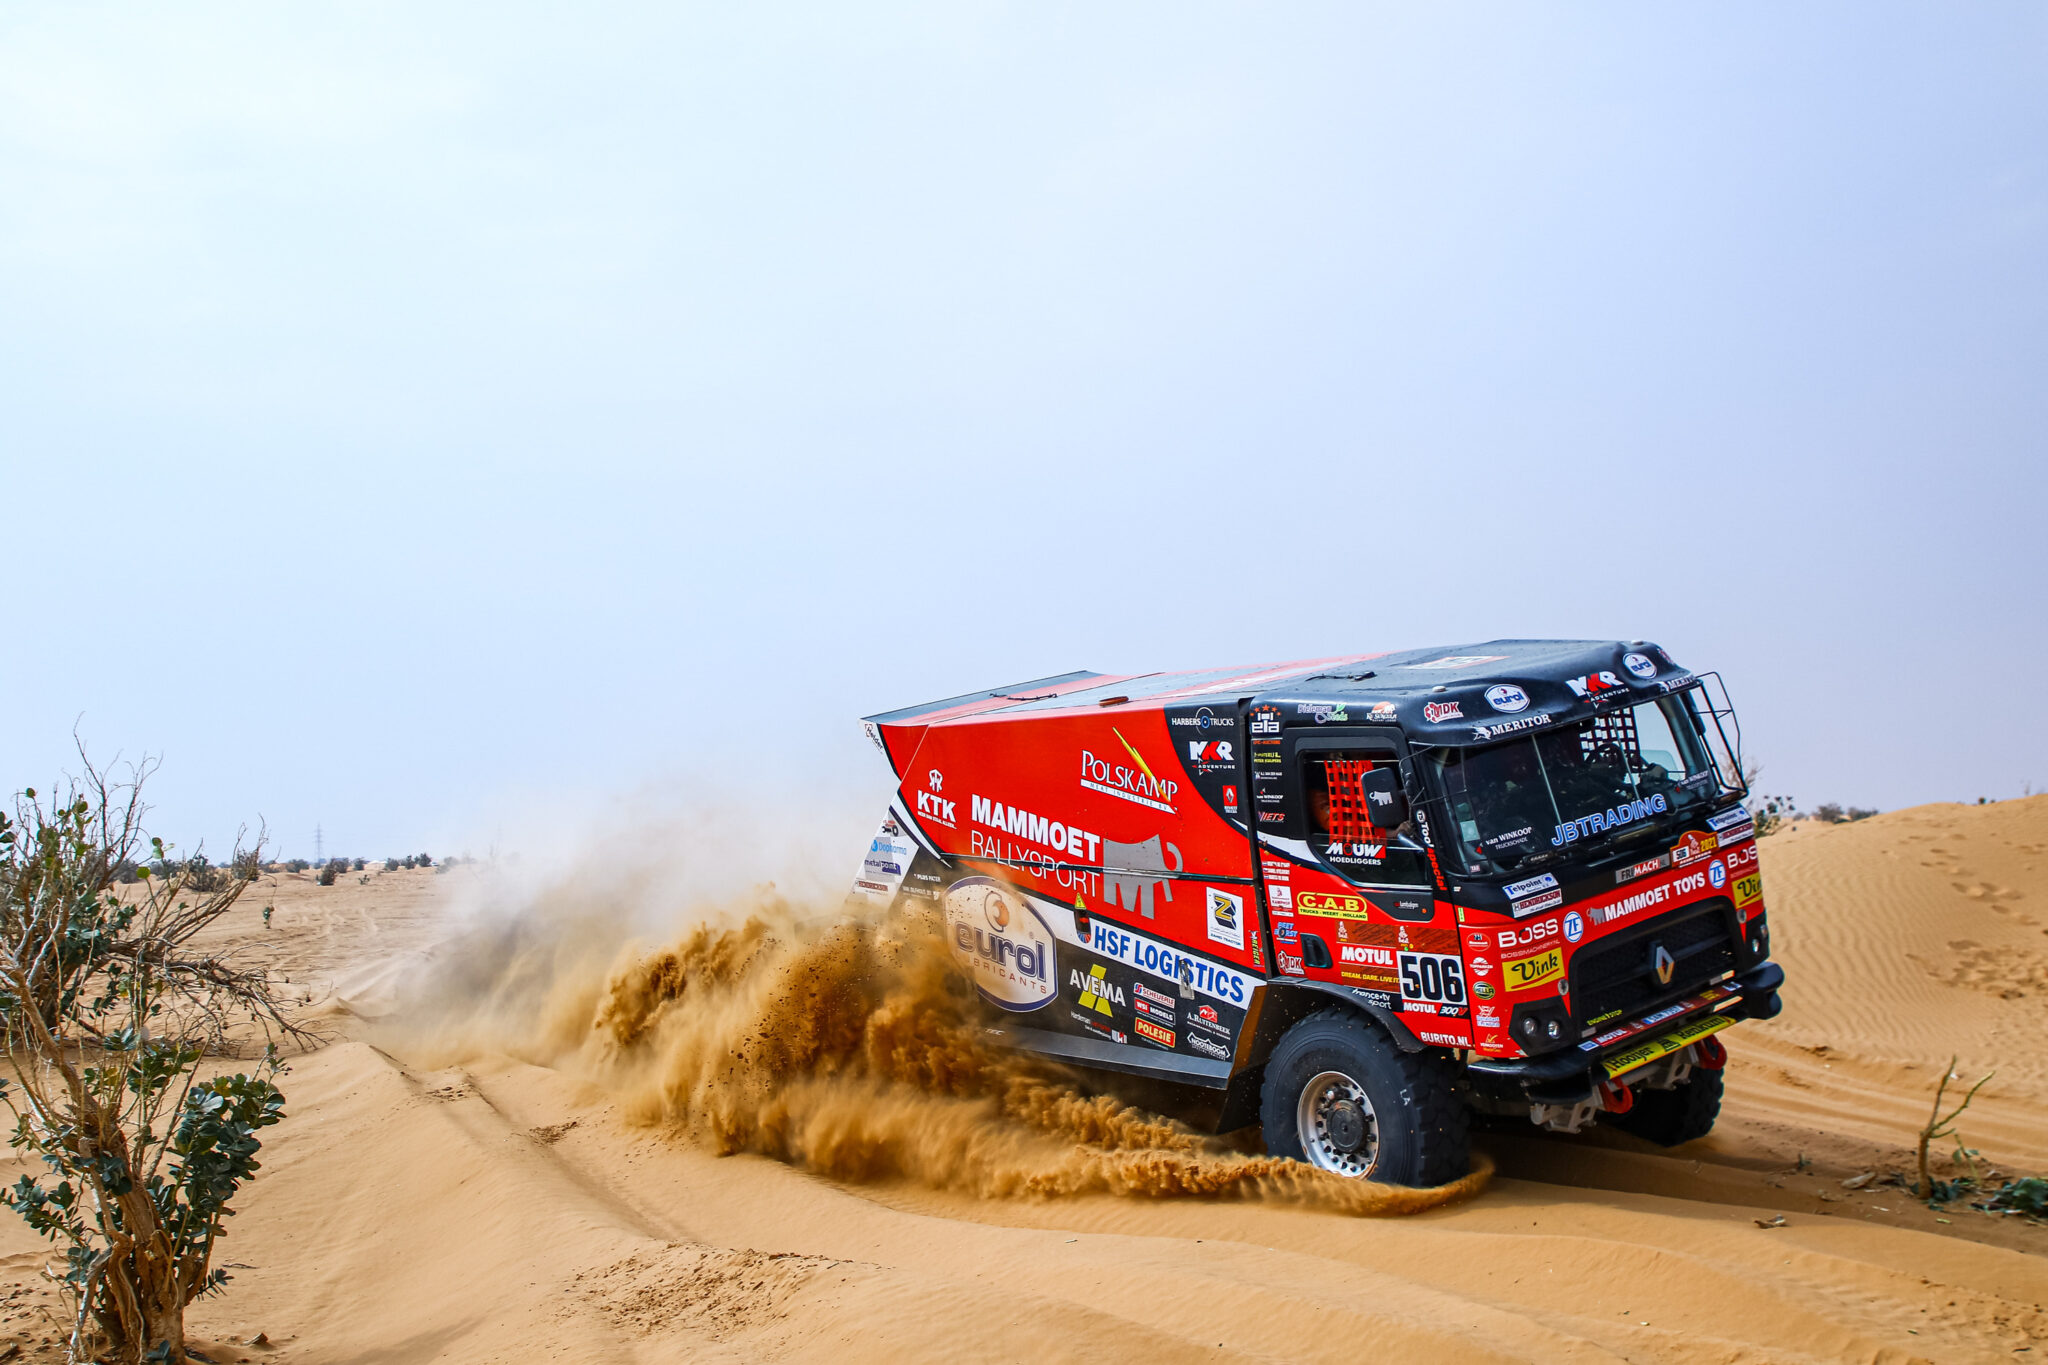 Dakar et rally-raid - Page 12 0112-Mammoet-54911efa-89a8-46d2-88b7-a9acb5420087-scaled